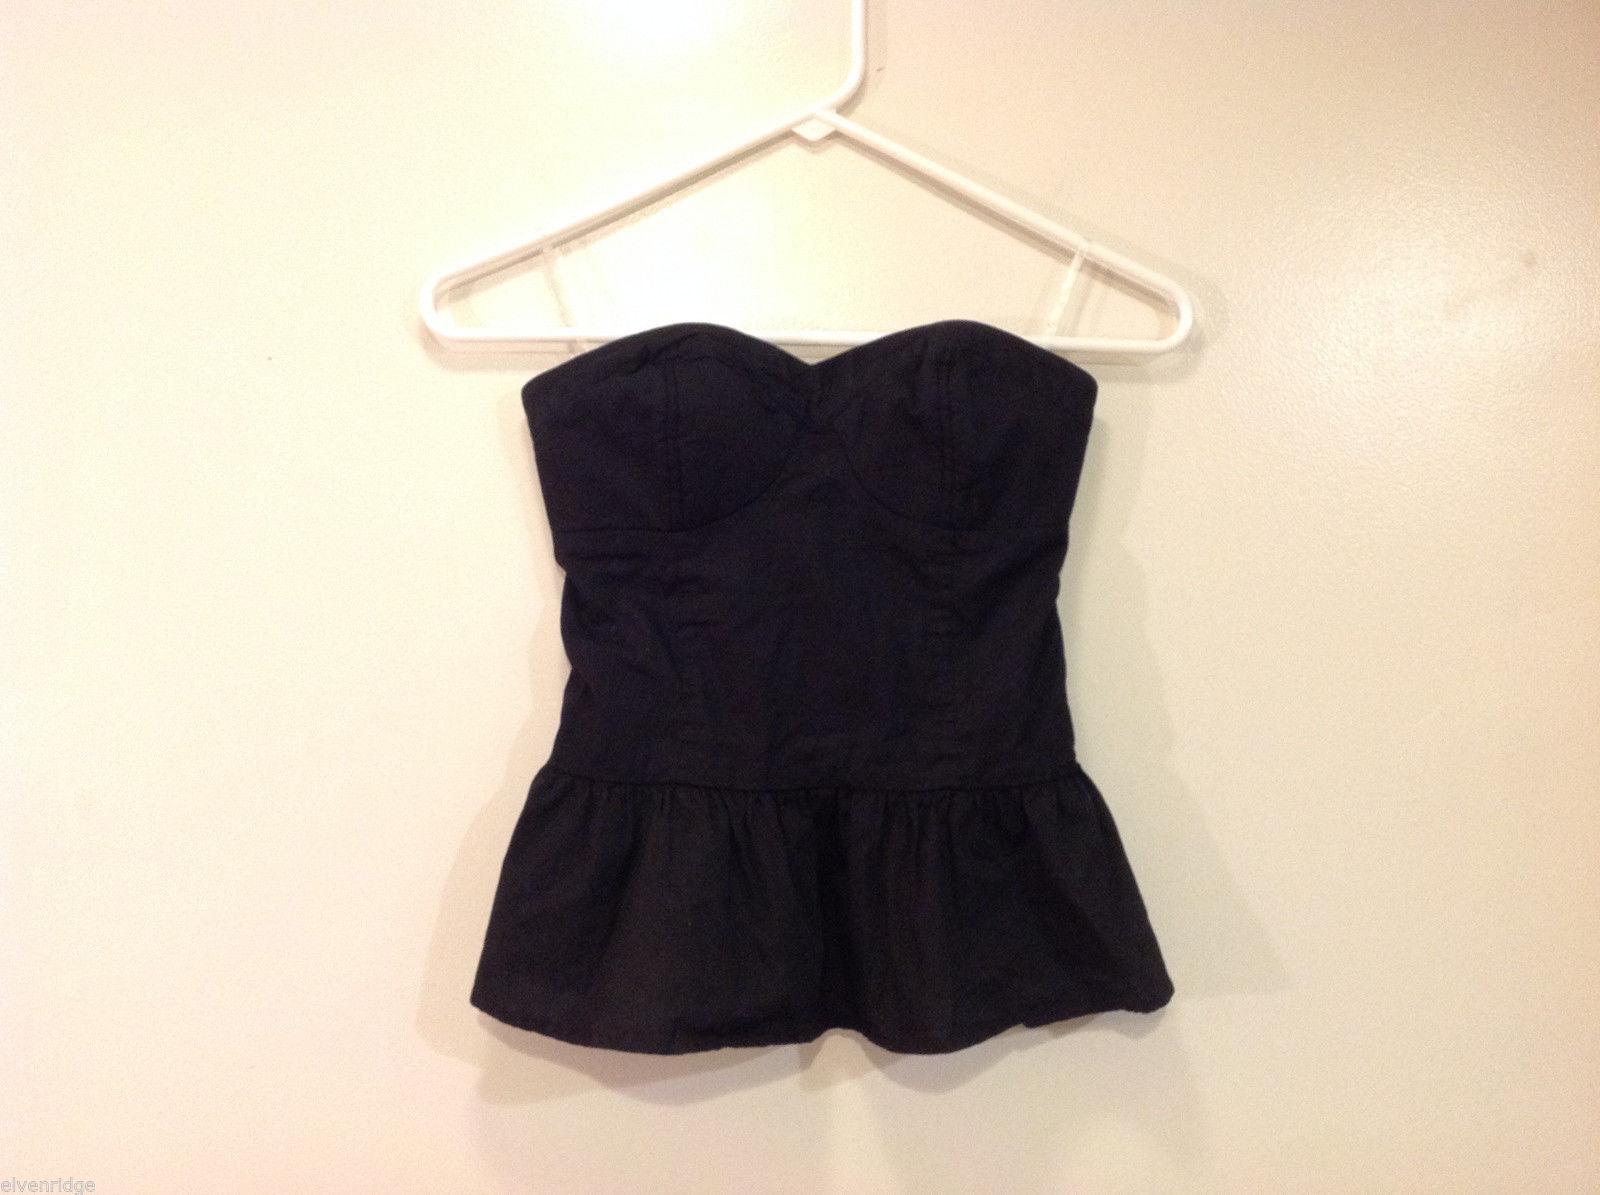 Xhilaration Black 100% cotton Strapless Bustier Bra, Size Small